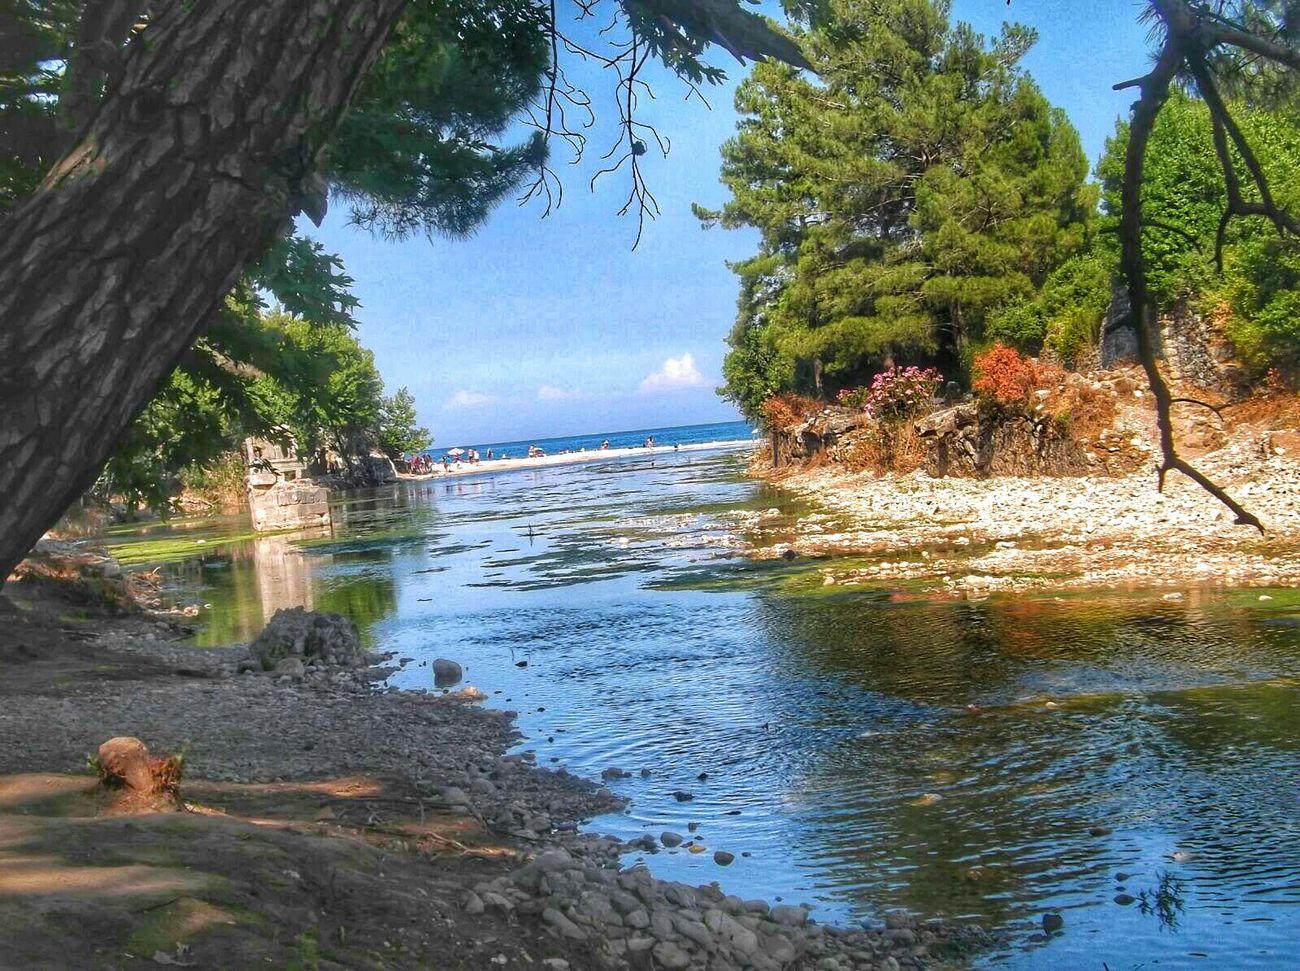 Antalya Turkey Sea View River View Mediterranean  Peaceful People And Nature Olympos Antalya Olympos Beach Hapiness🍹